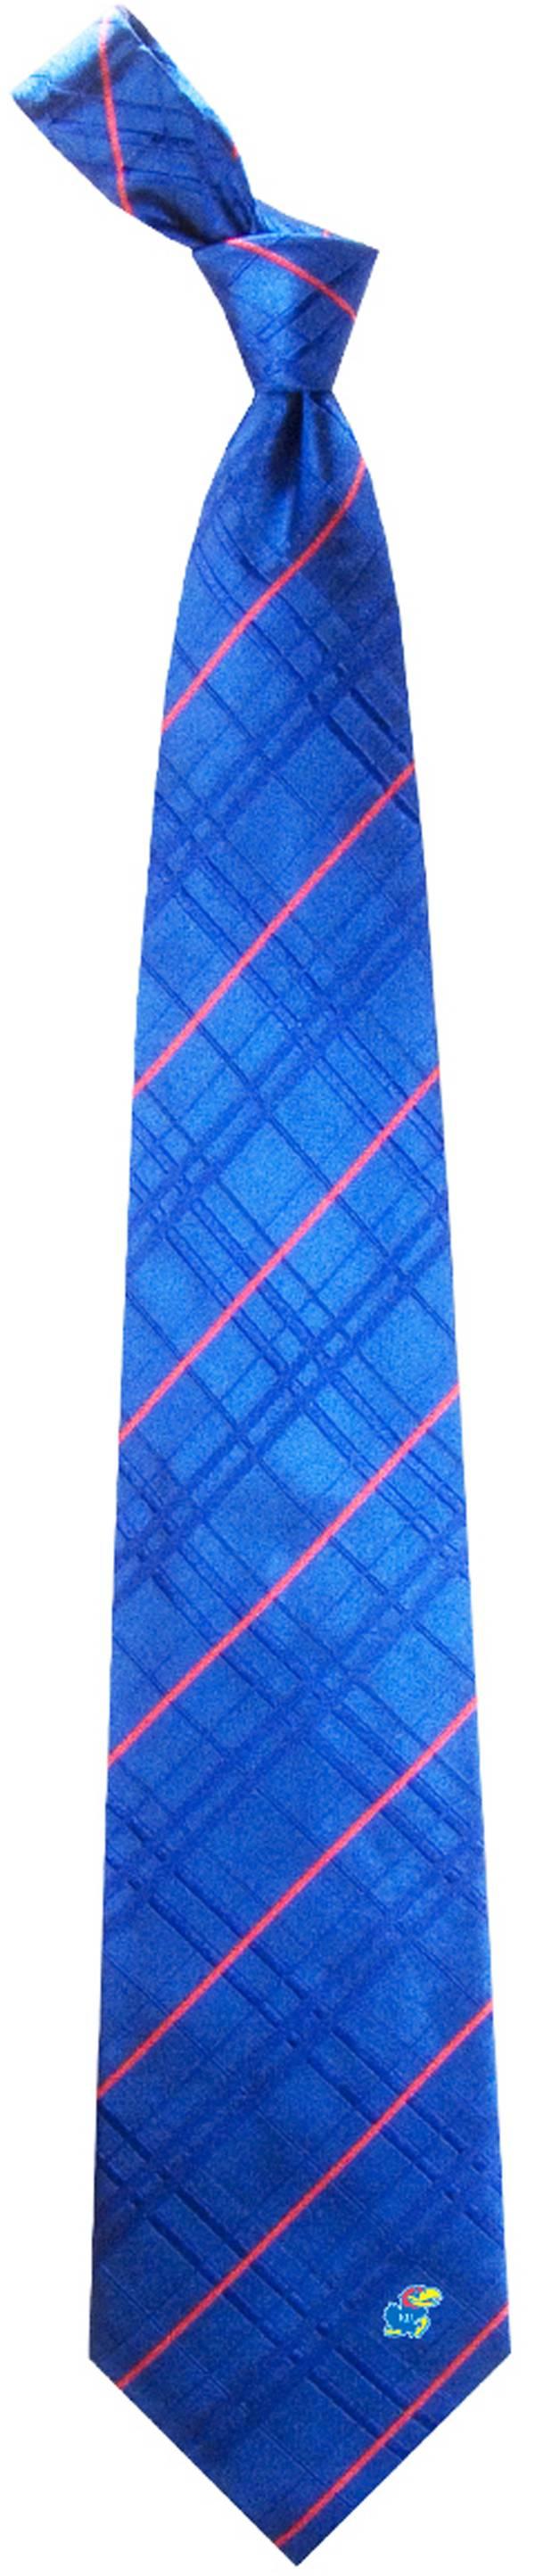 Eagles Wings Kansas Jayhawks Woven Oxford Necktie product image